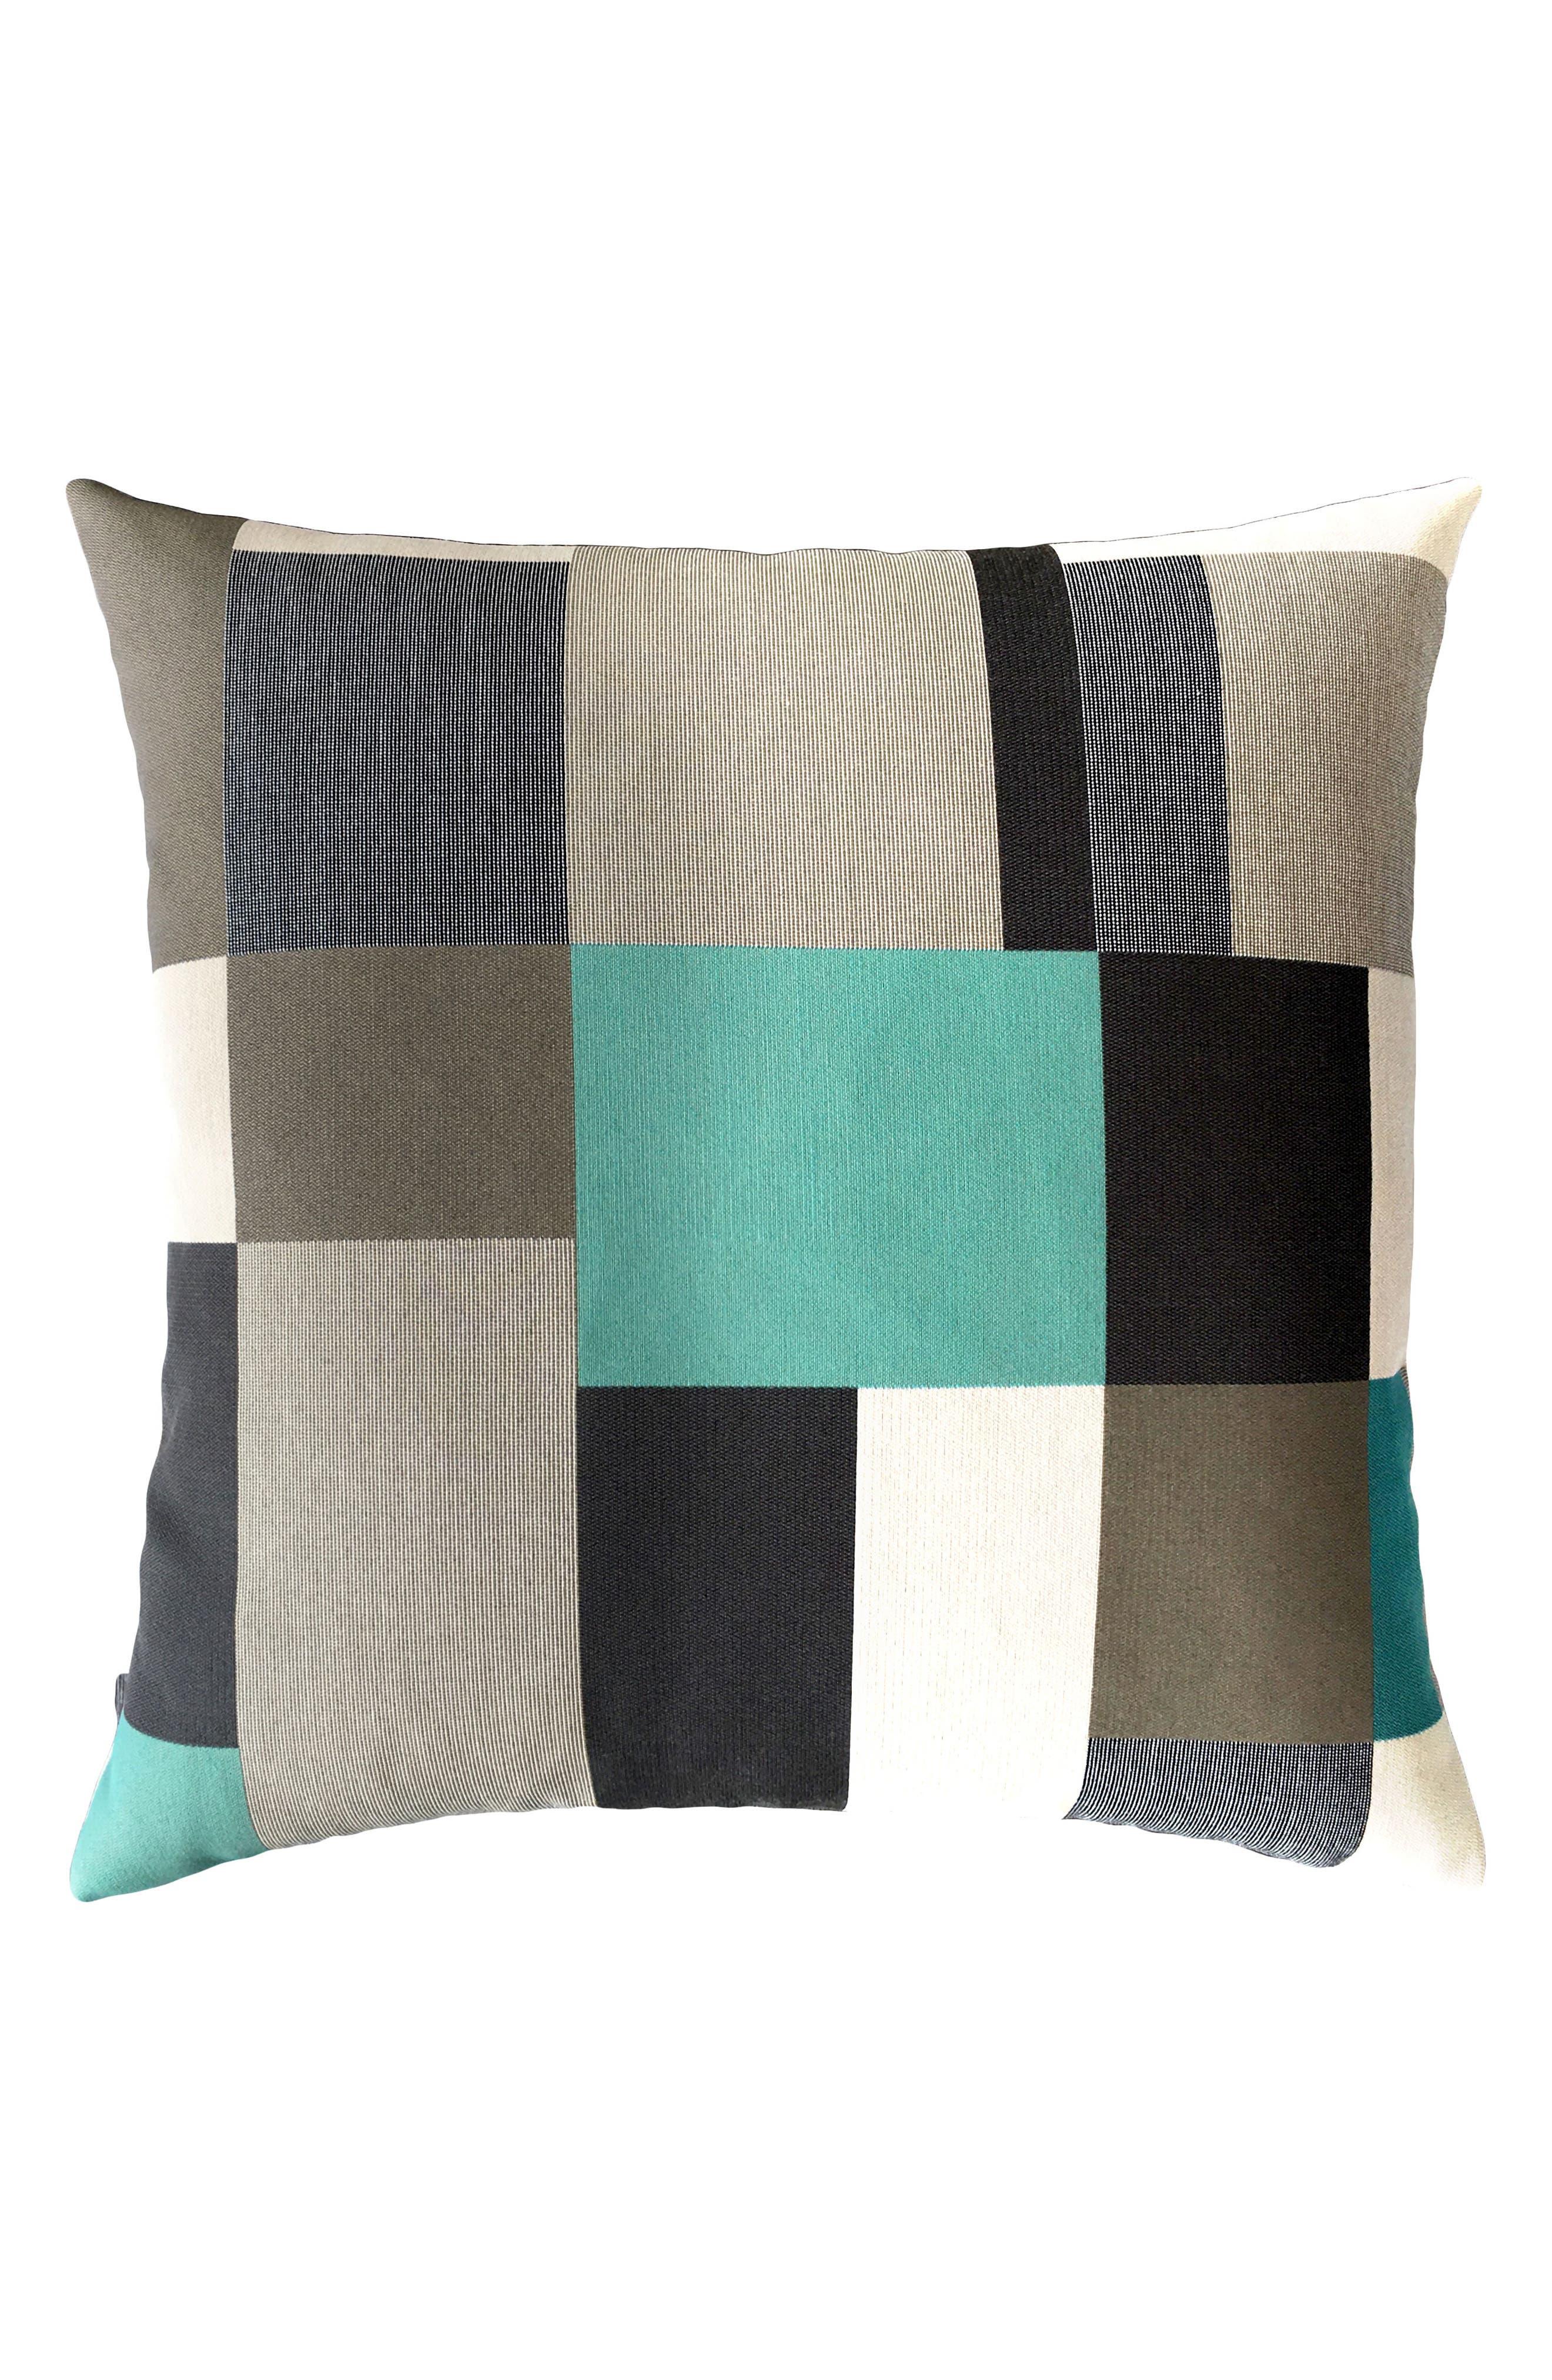 Noir Block Indoor/Outdoor Accent Pillow,                         Main,                         color, Blue/ Black